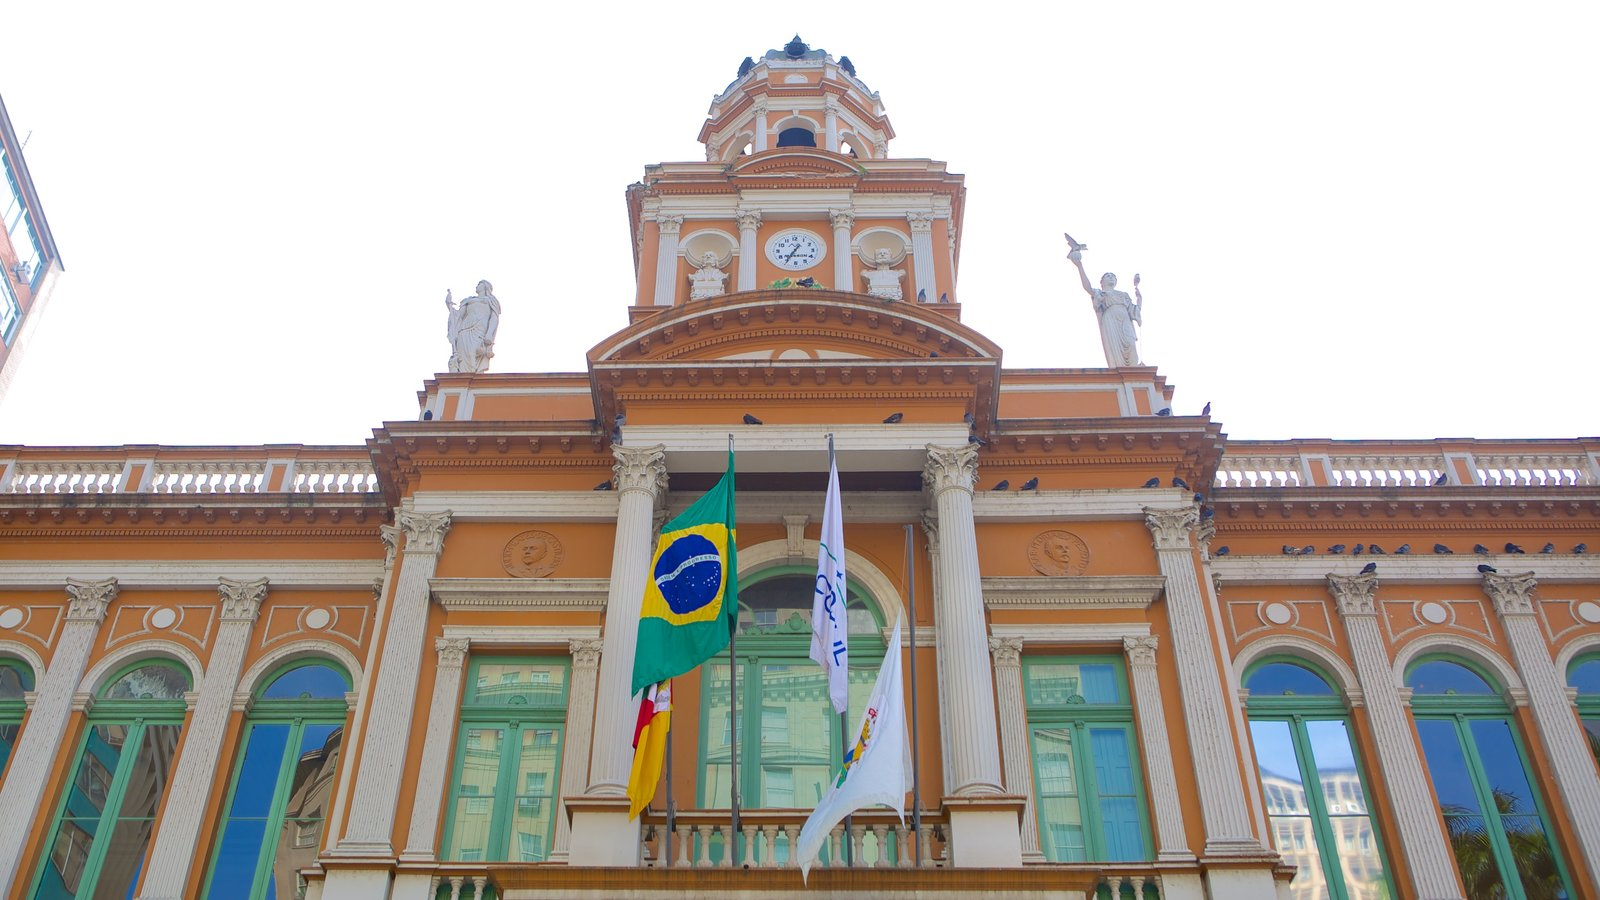 Porto Alegre caracterizando arquitetura de patrimônio